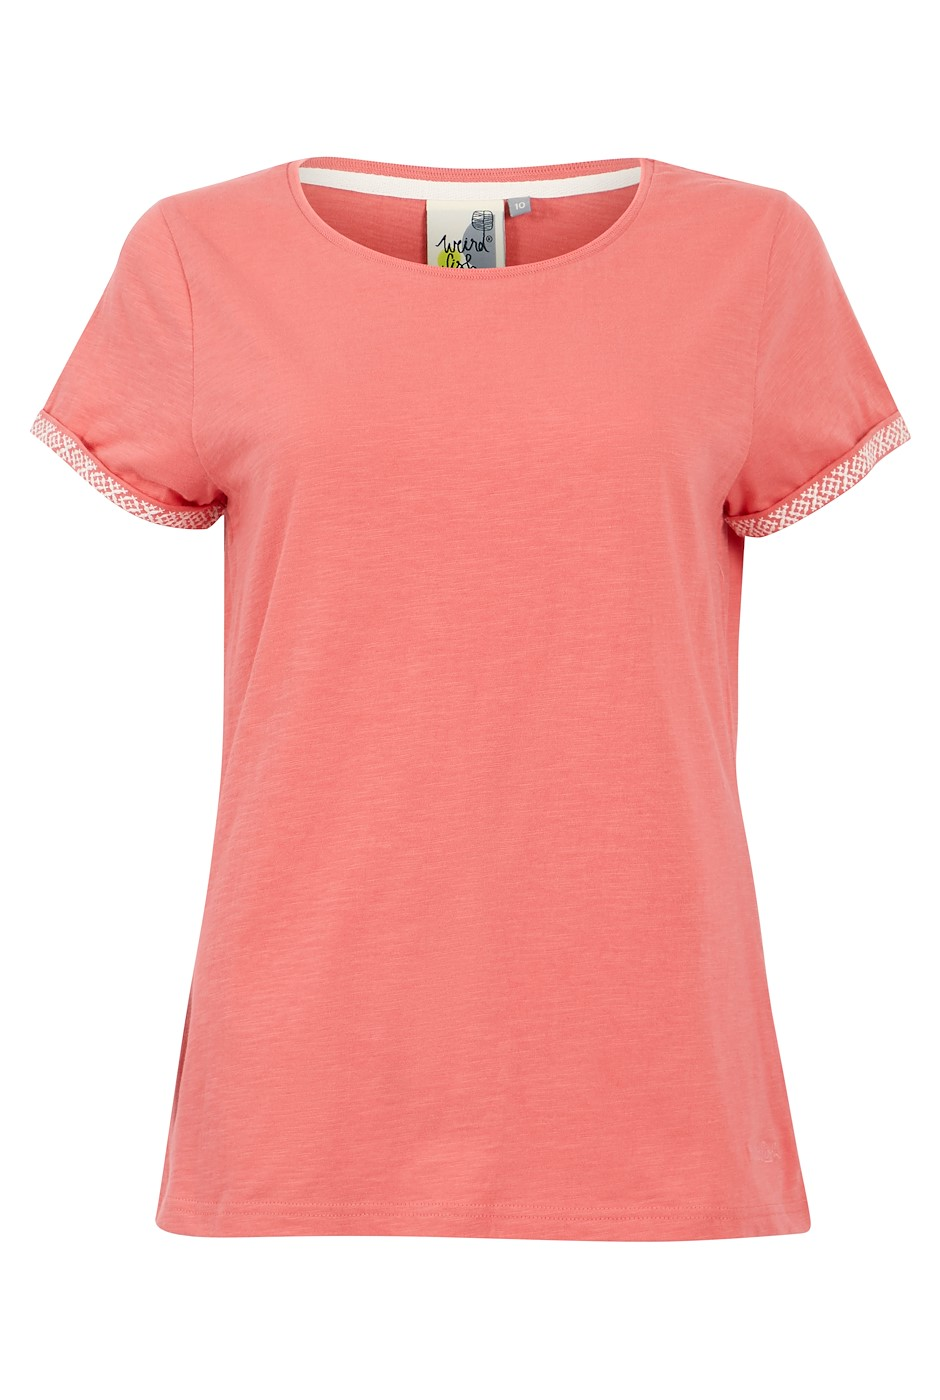 Trinity Organic Cotton Outfitter T-Shirt Tea Rose